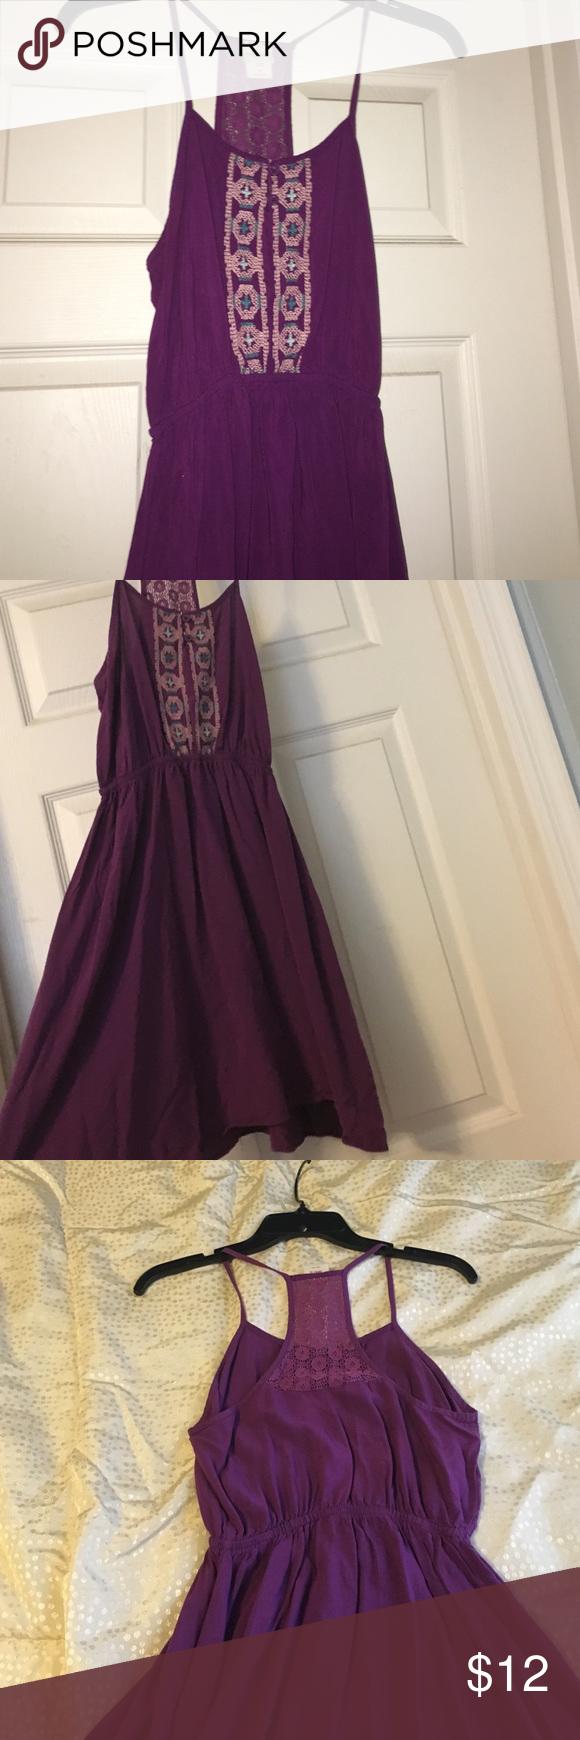 Purple Mossimo dress! Size S Purple Mossimo dress! Size S. Very comfortable dress. Happy poshing 💖😍🌹😍💖 Mossimo Supply Co Dresses